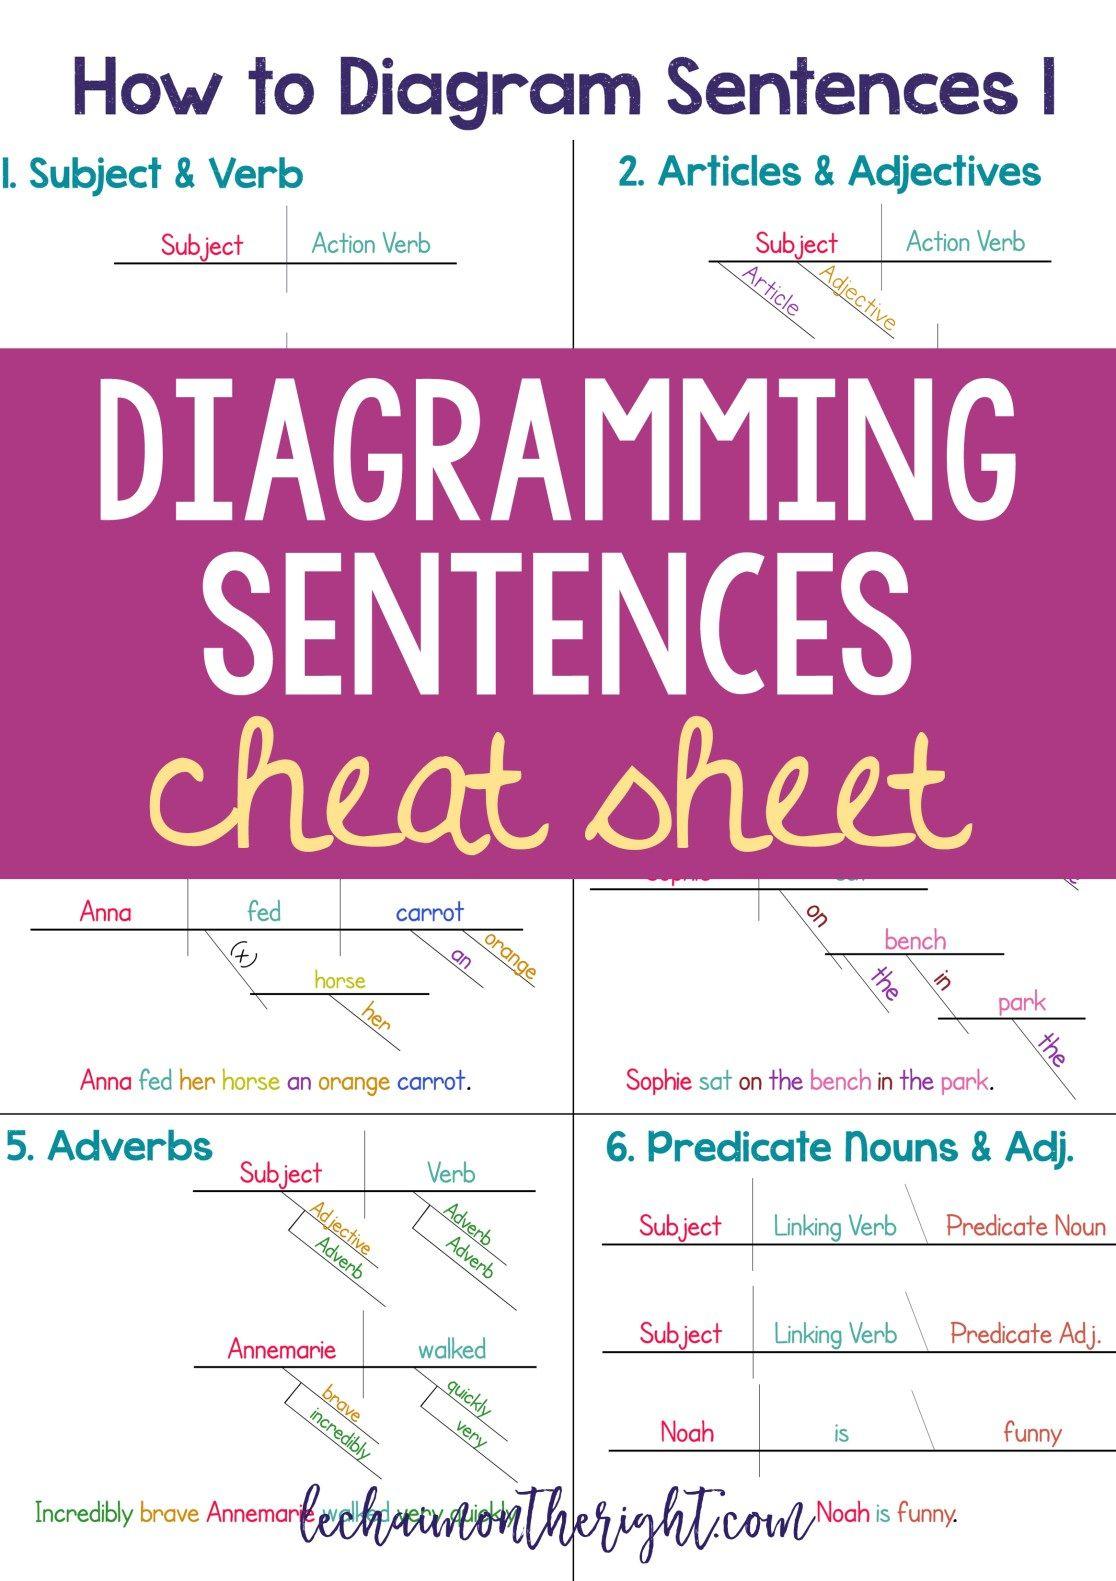 Diagramming Sentences Cheat